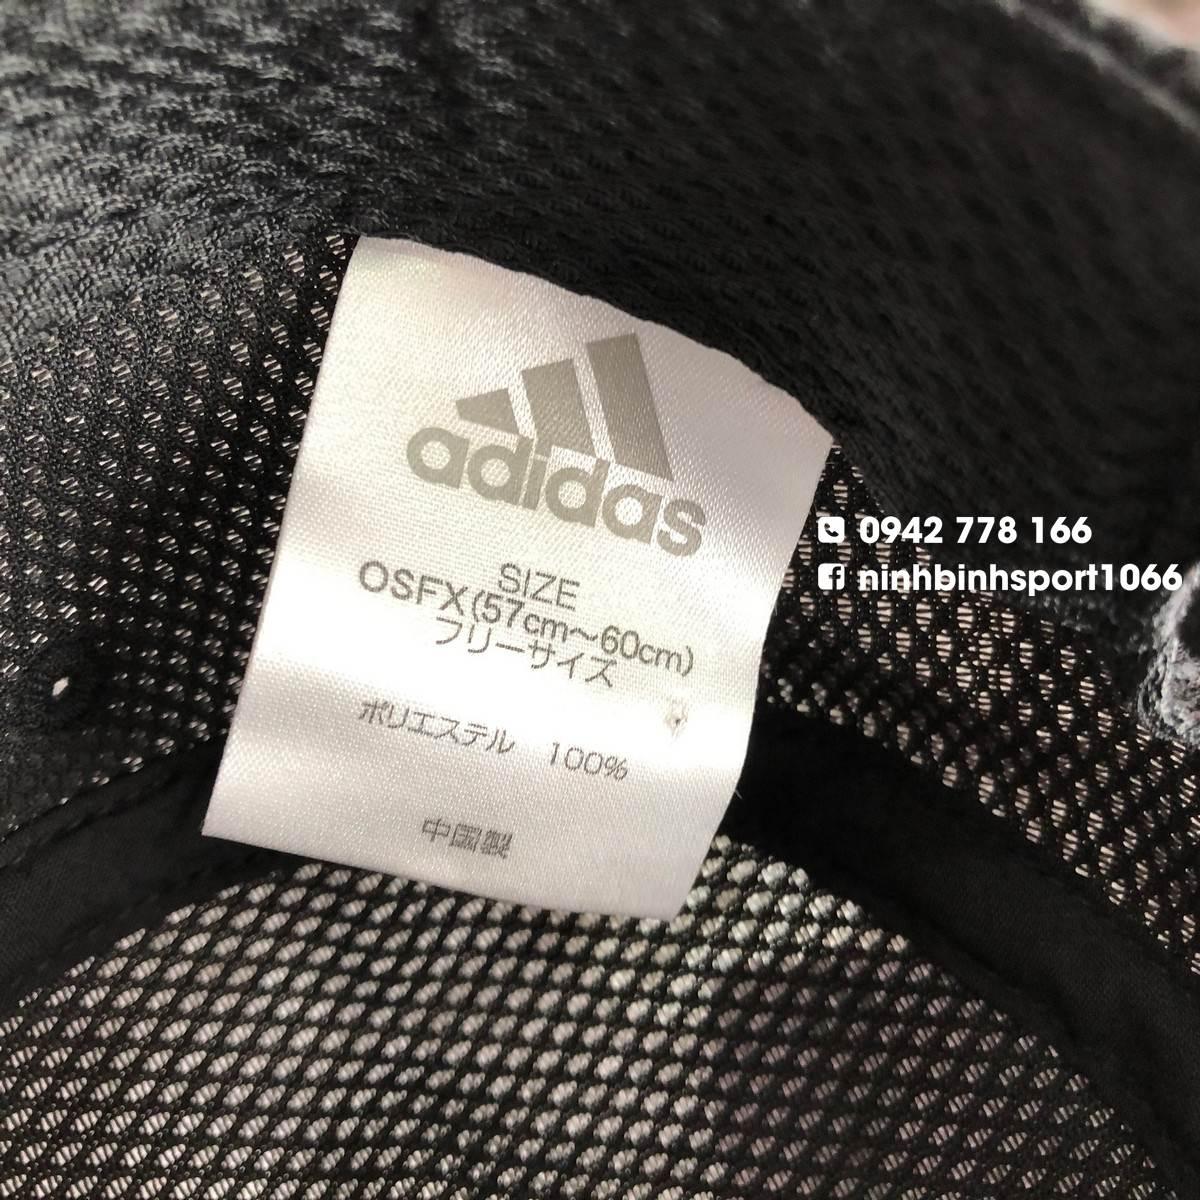 Mũ thể thao Adidas 515-01-OSFX